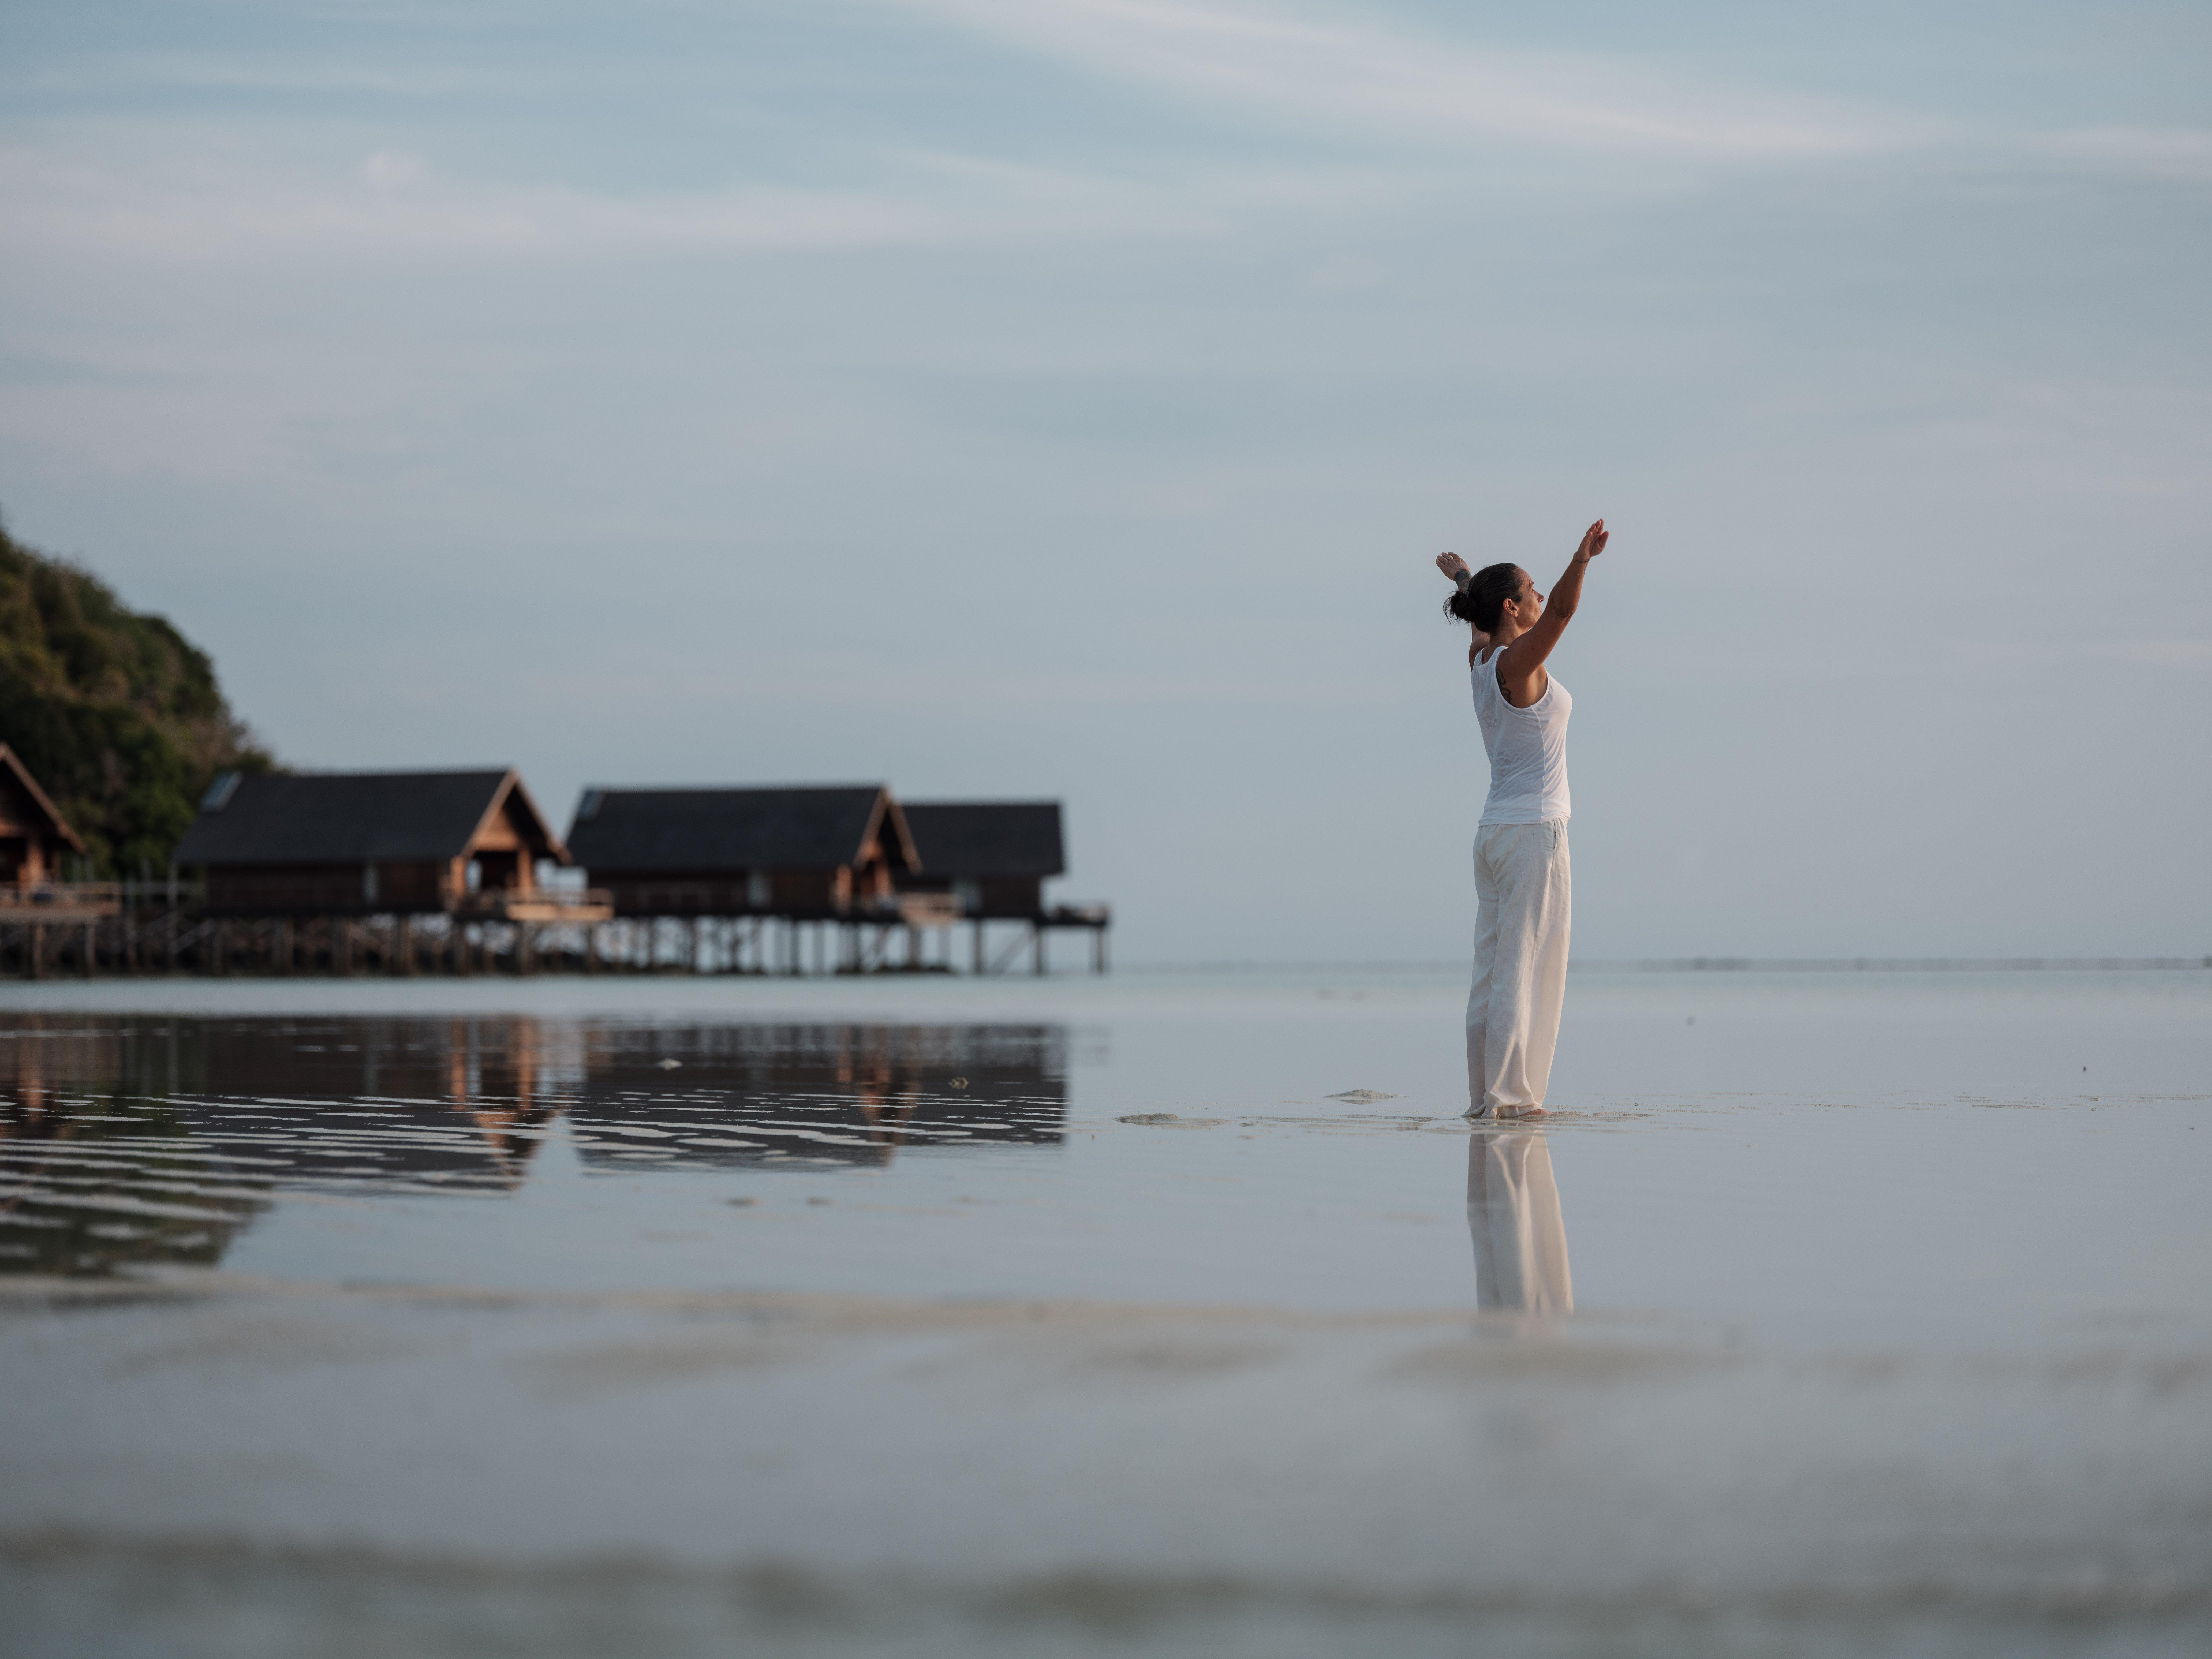 Bawah-reserve-medium-res-1741 Wellbeing Lisa Beach Sunrise movement